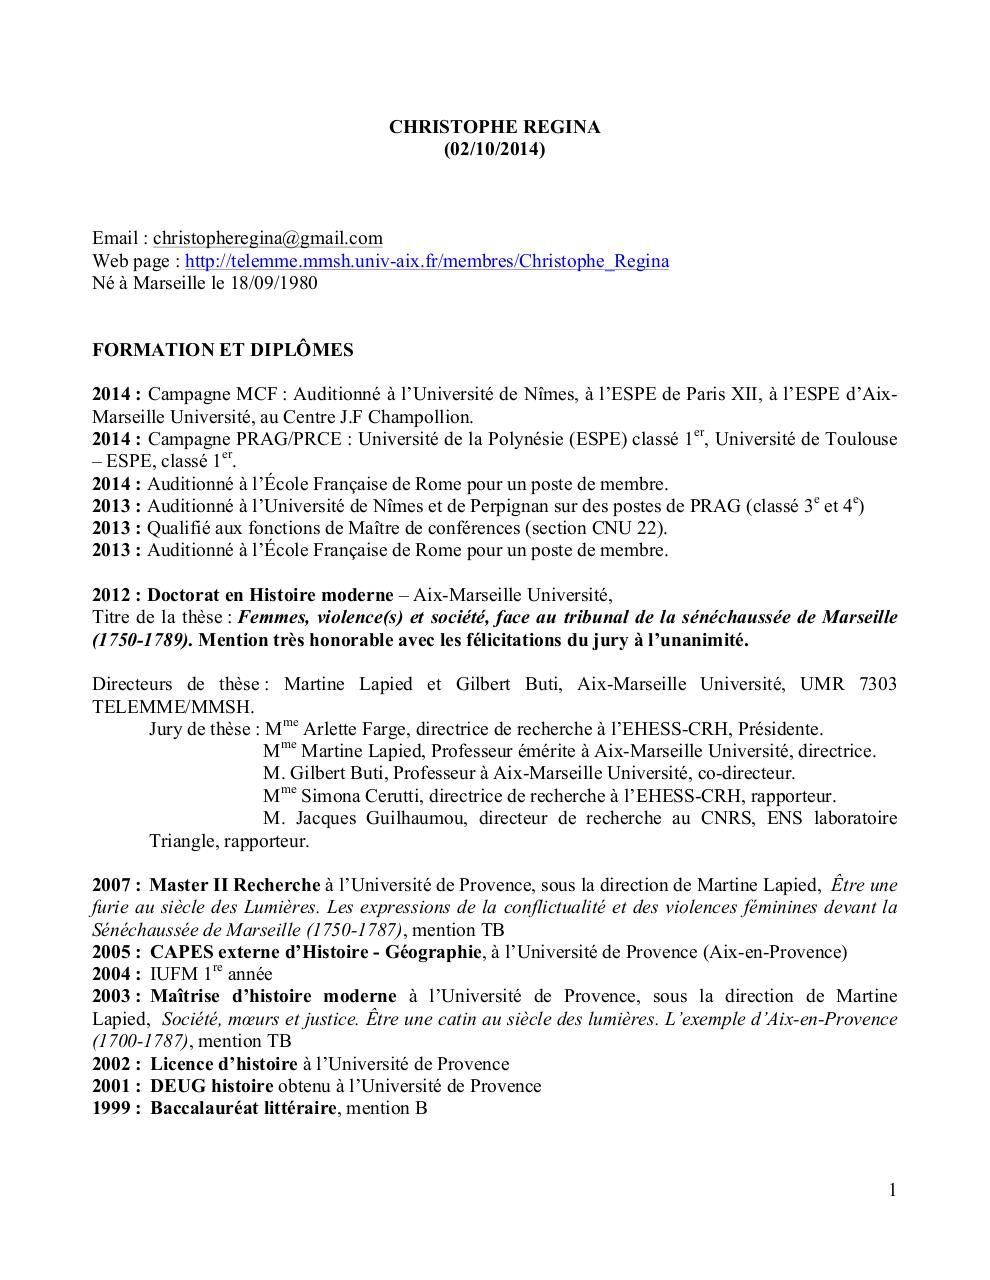 regina cv docx - regina cv-2 pdf